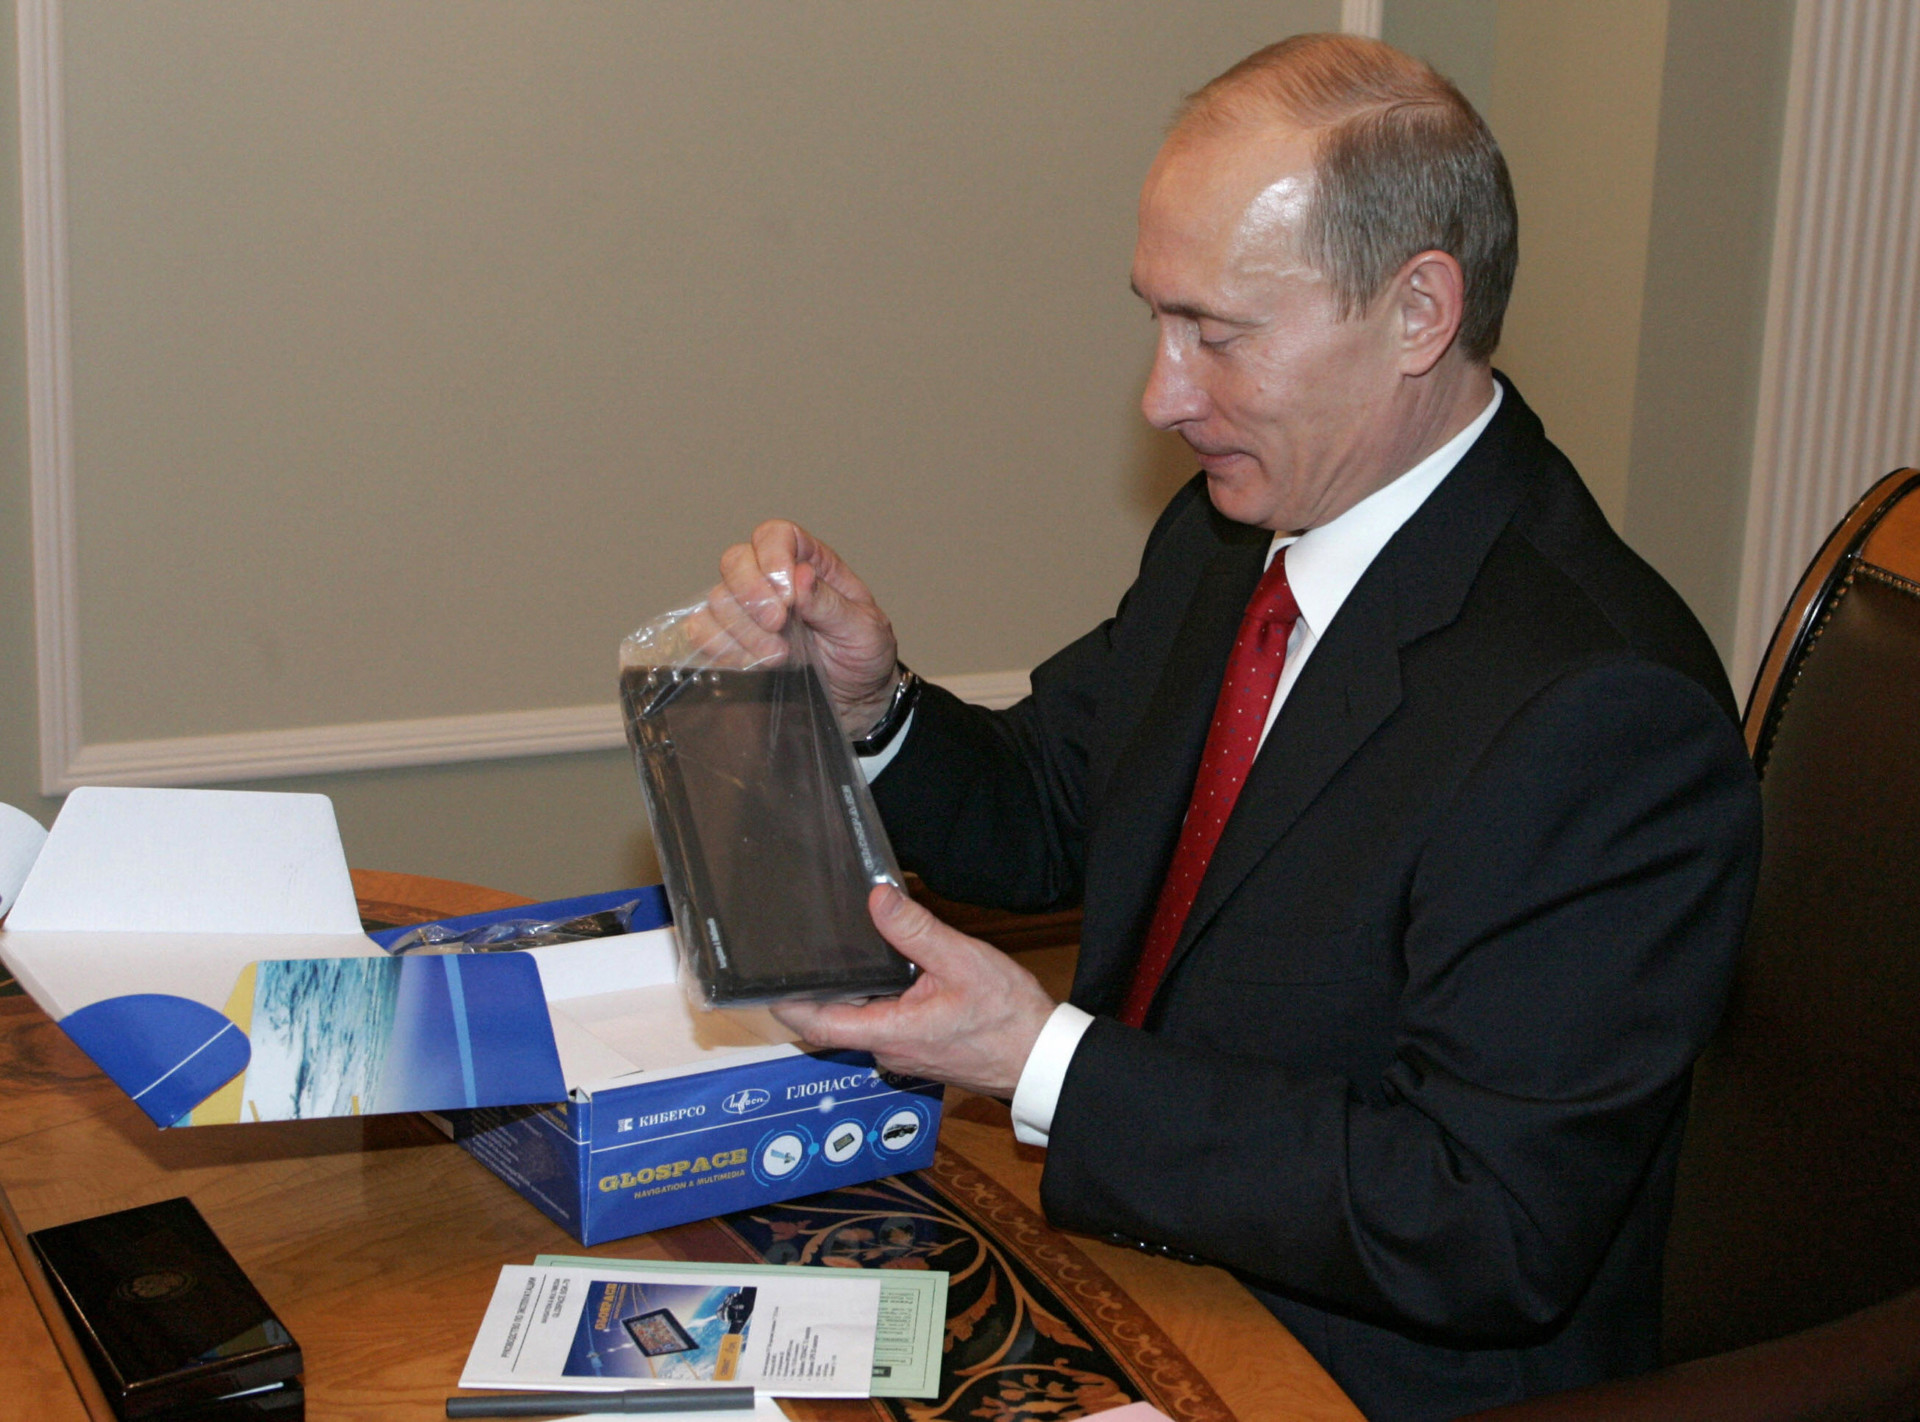 Exclusive: Western Intelligence Fears New Russian Sat-Nav's Espionage Capabilities